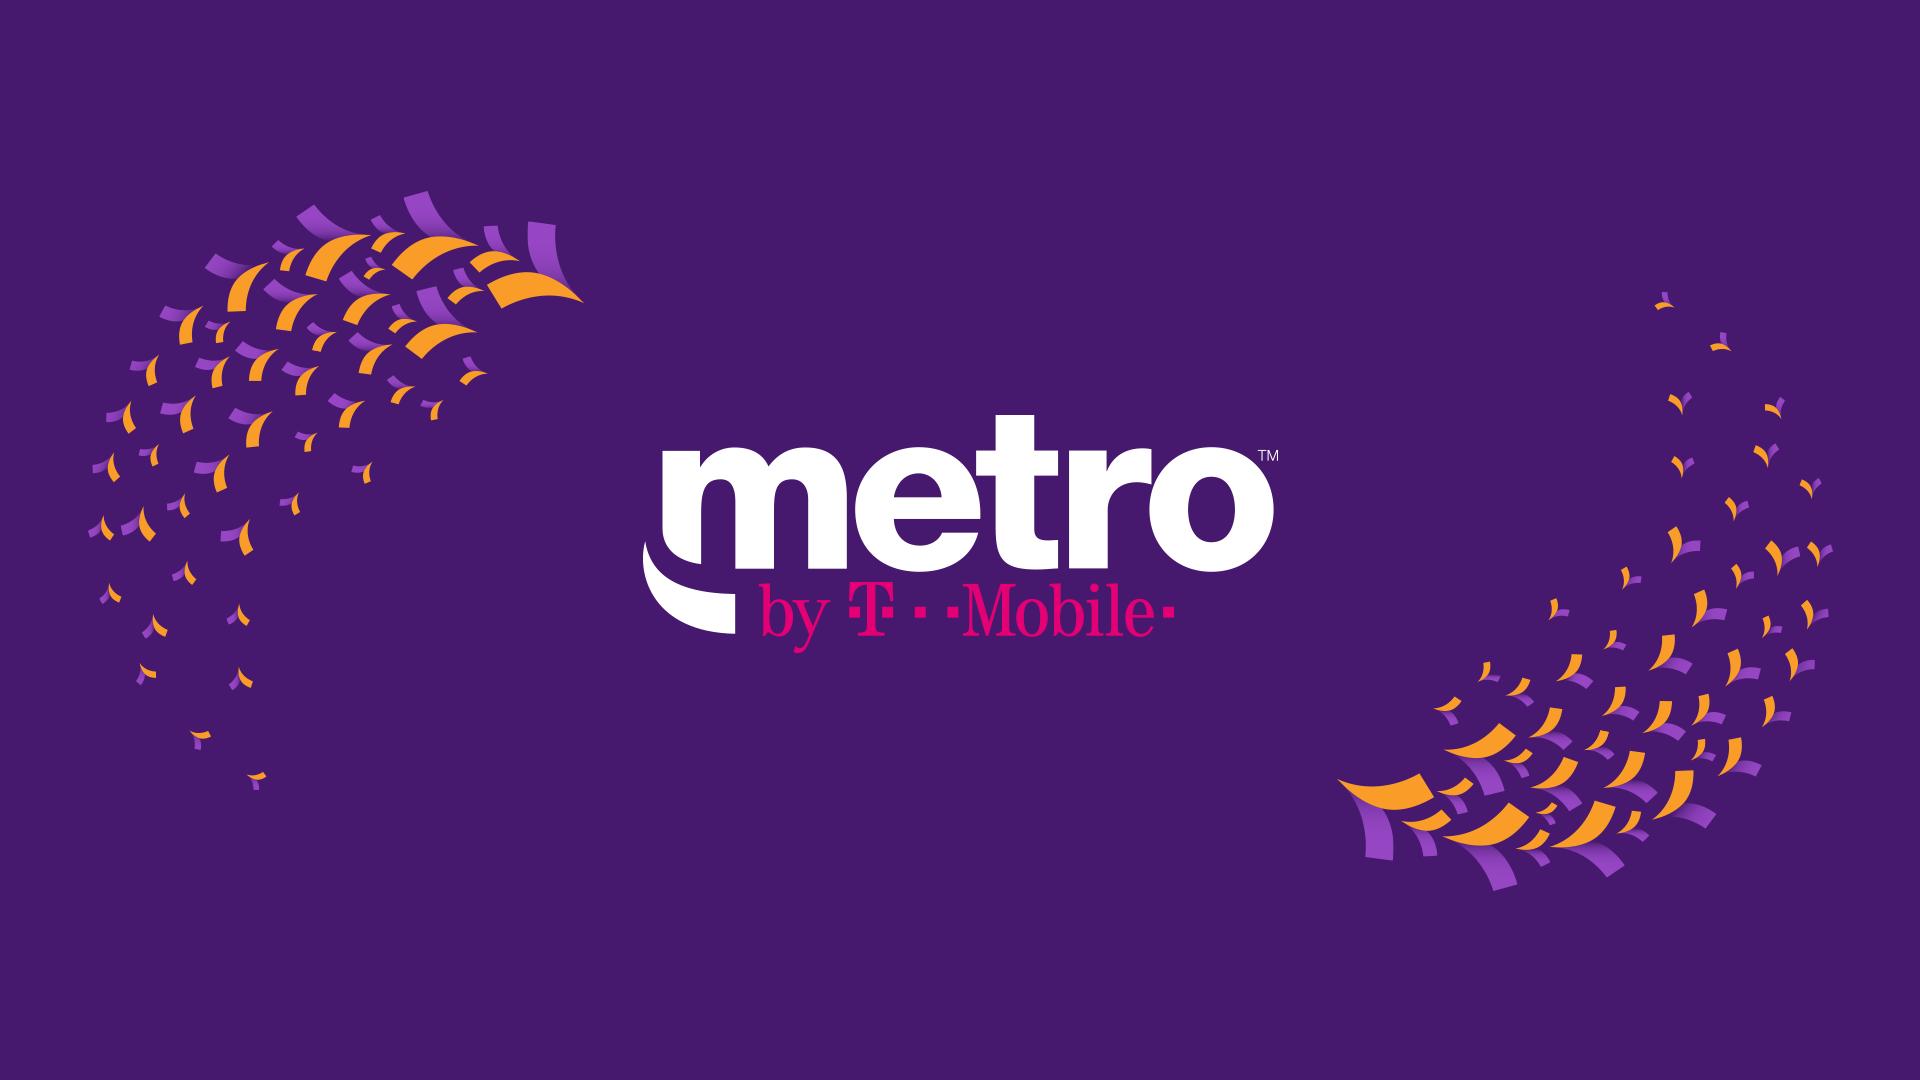 MetroPCS Lincoln